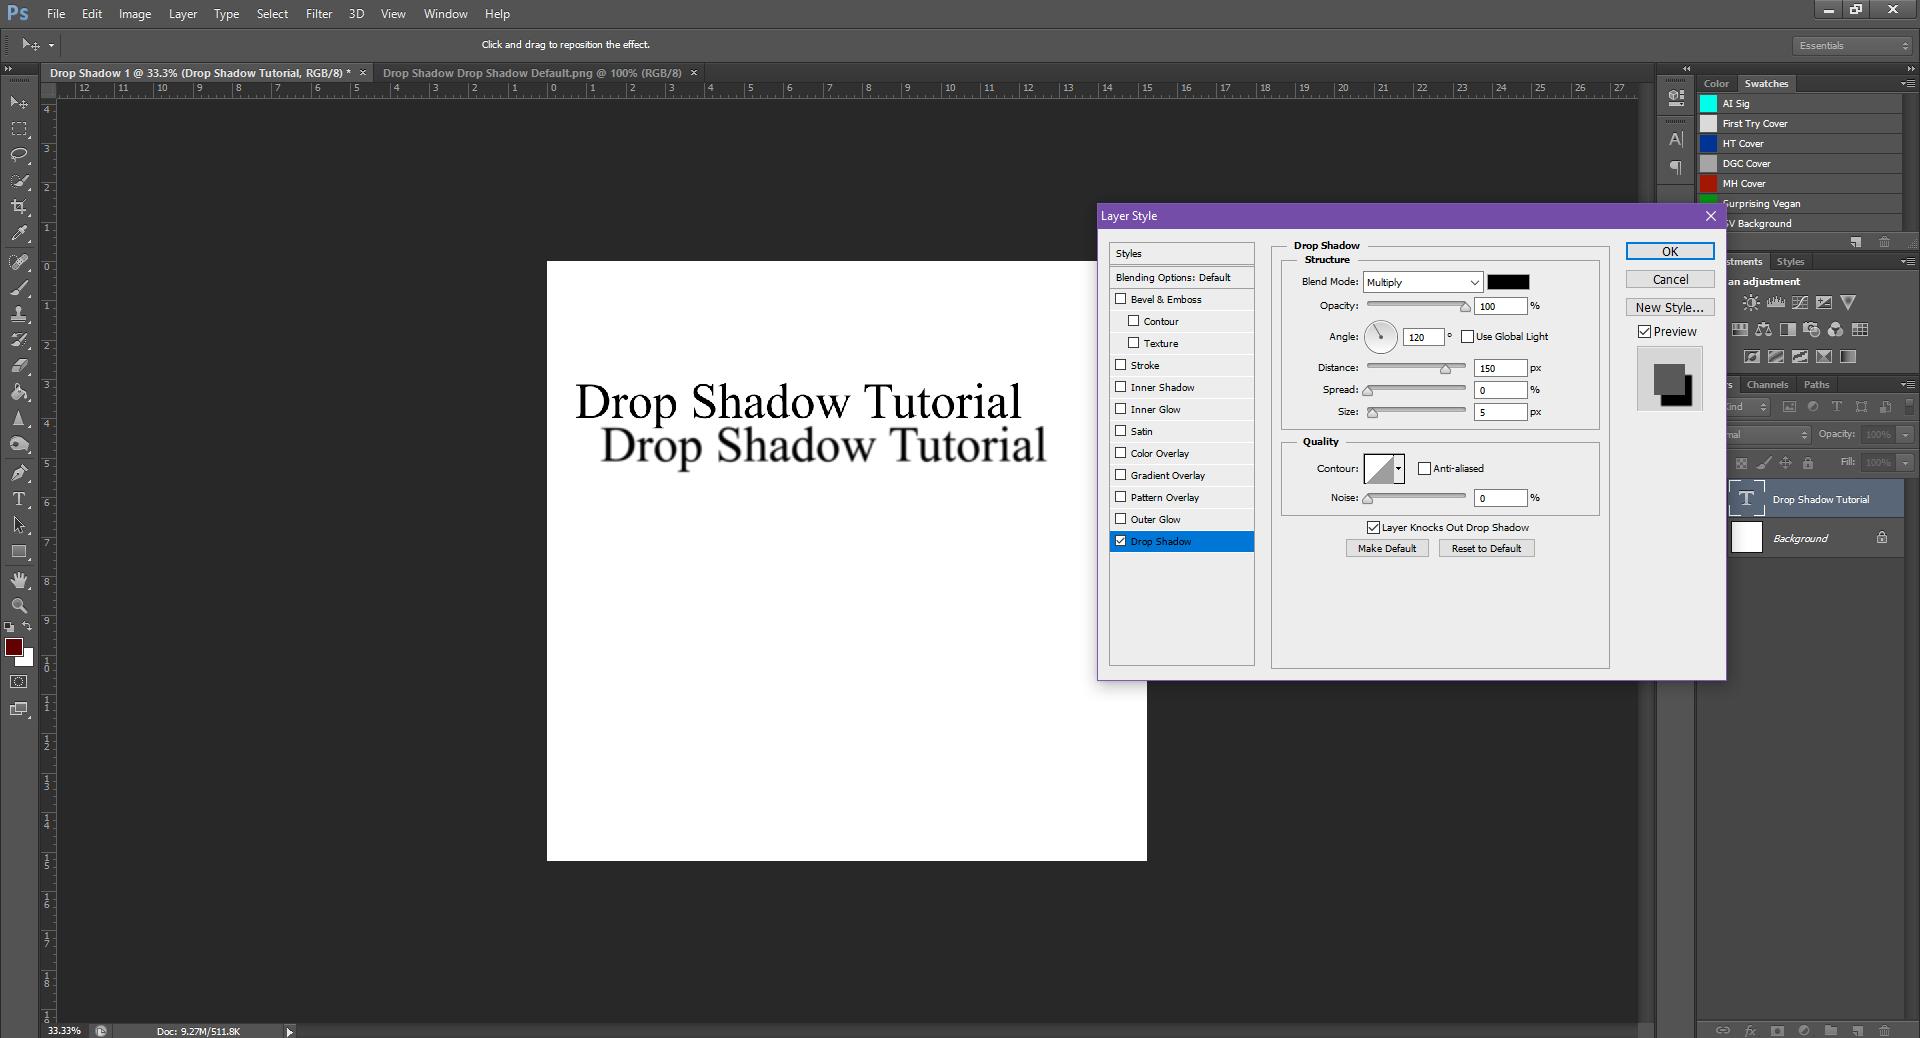 AterImber.com - Writing - Writing Tips - PHSH Tutorial - Drop Shadow - Angle 120